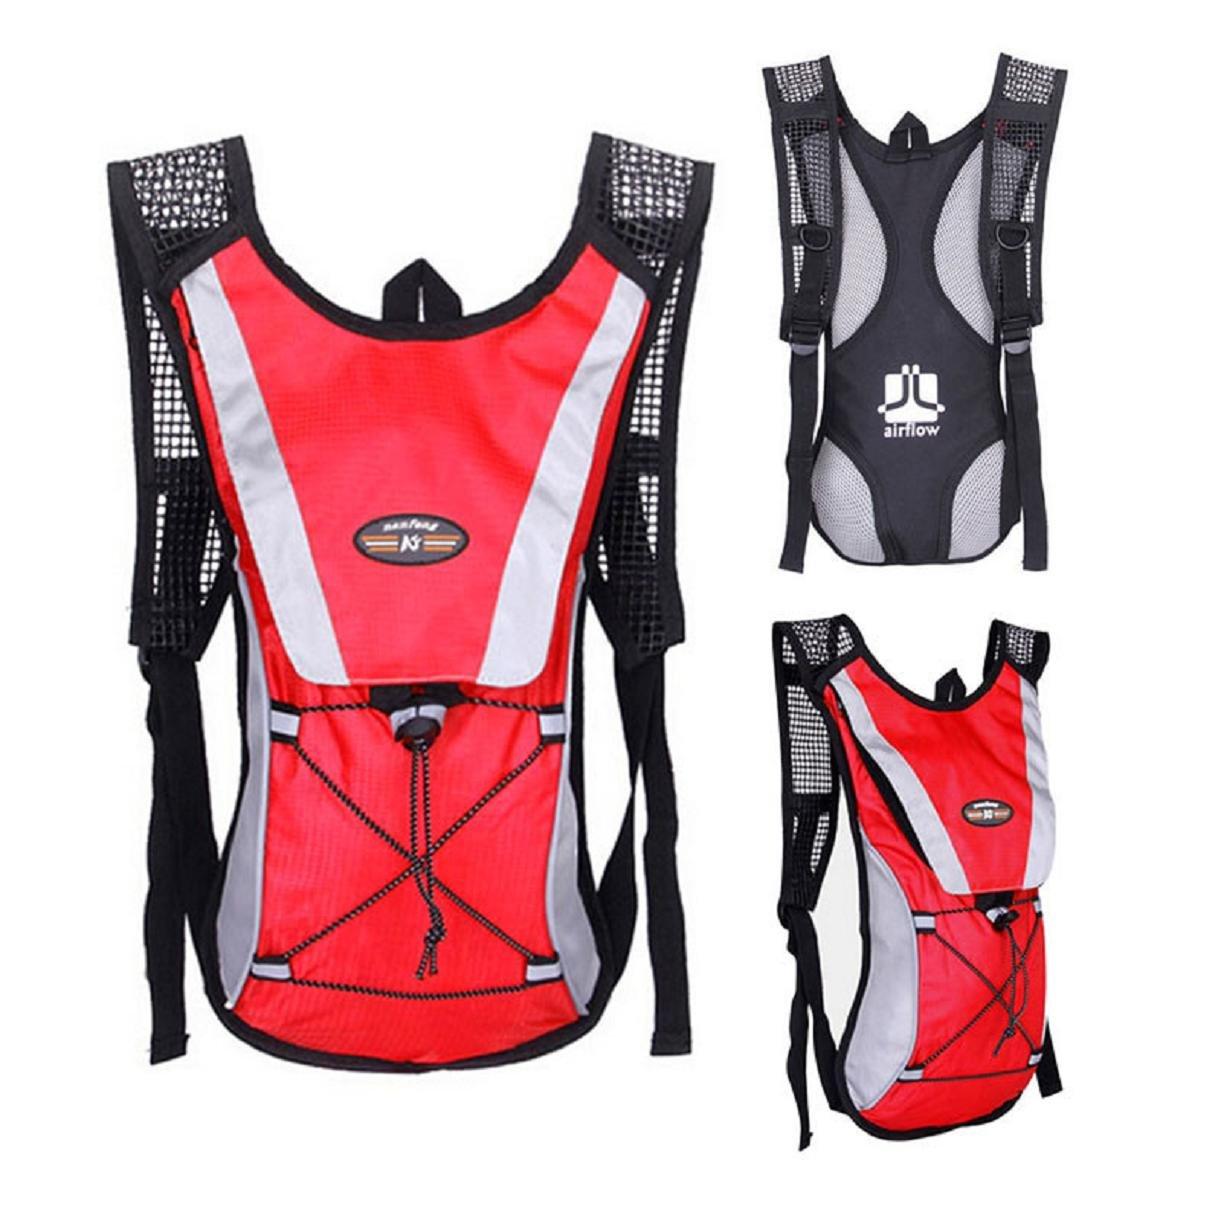 Lookatool Water Bladder Bag Backpack Hydration Camelbak Pack Hiking Camping 2L (Black)